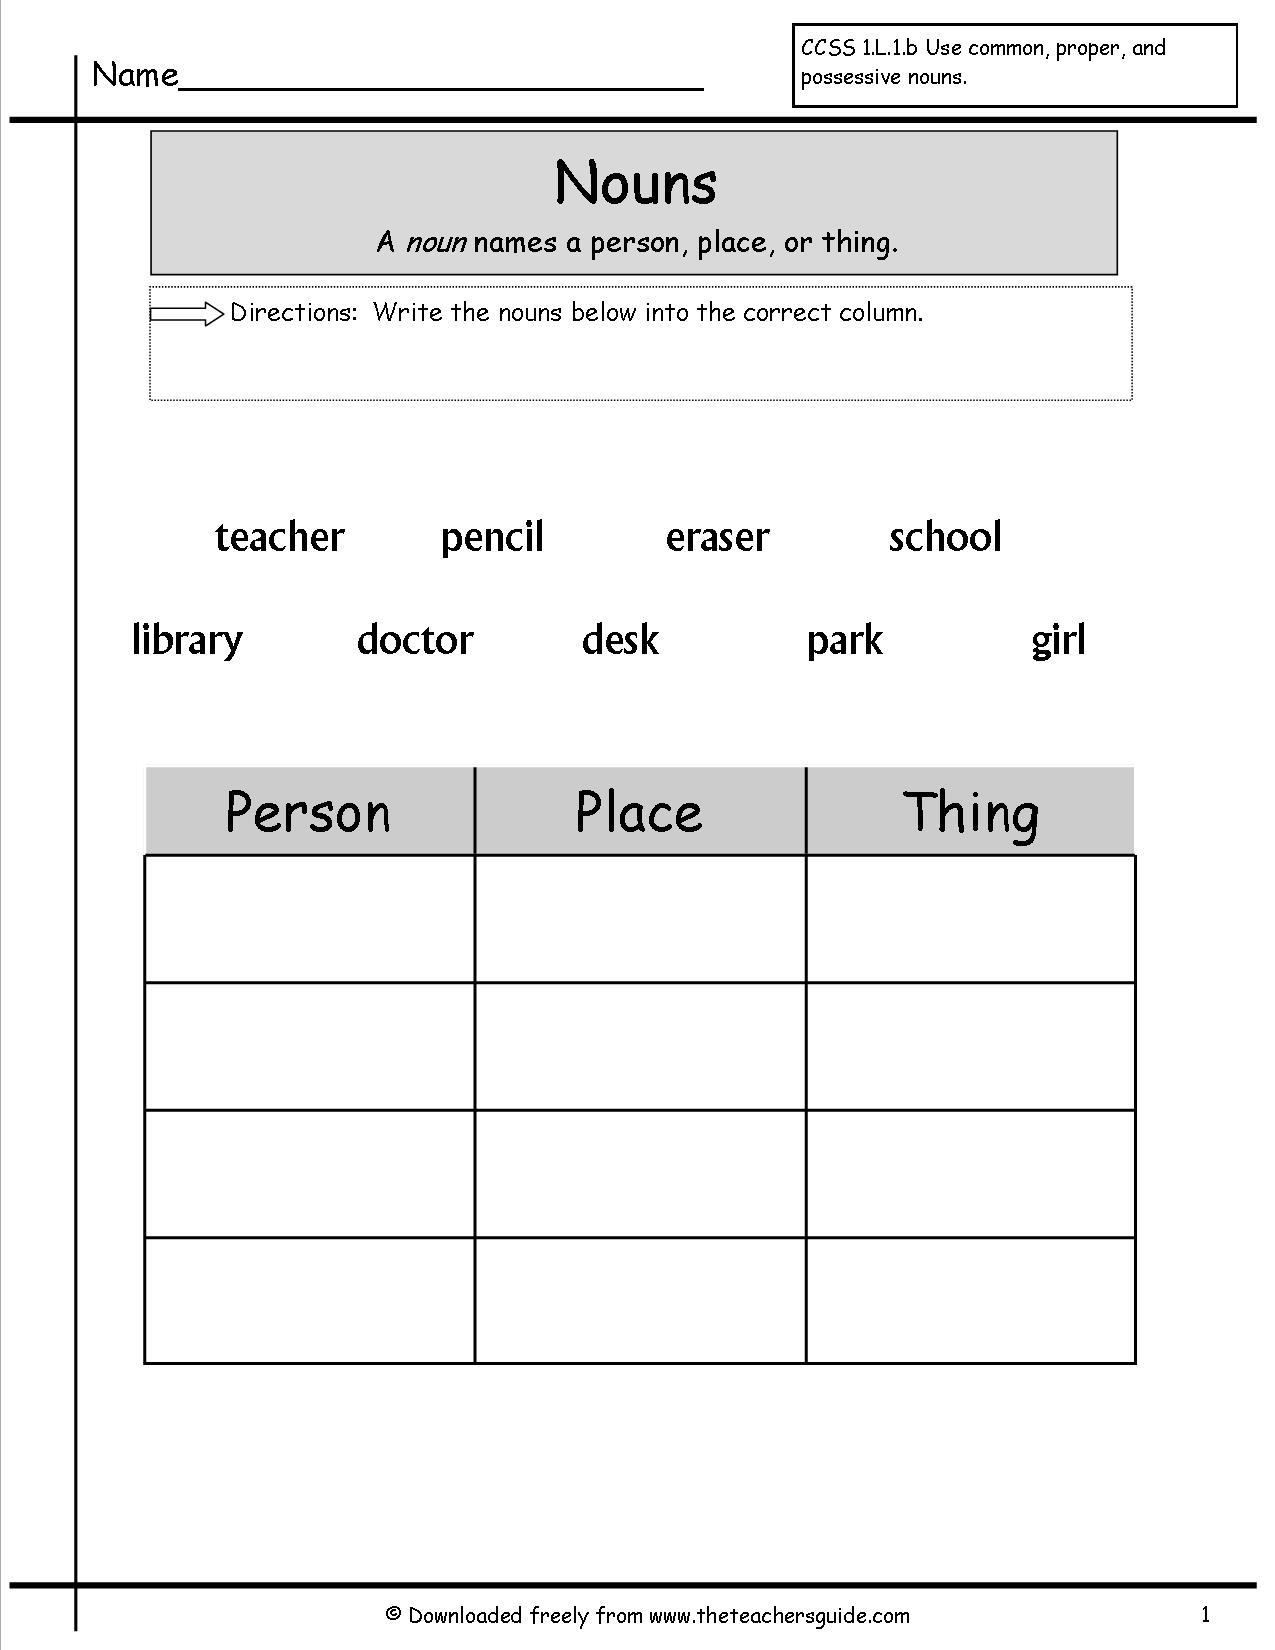 17 Best Images Of Prefix Suffix Worksheet Science